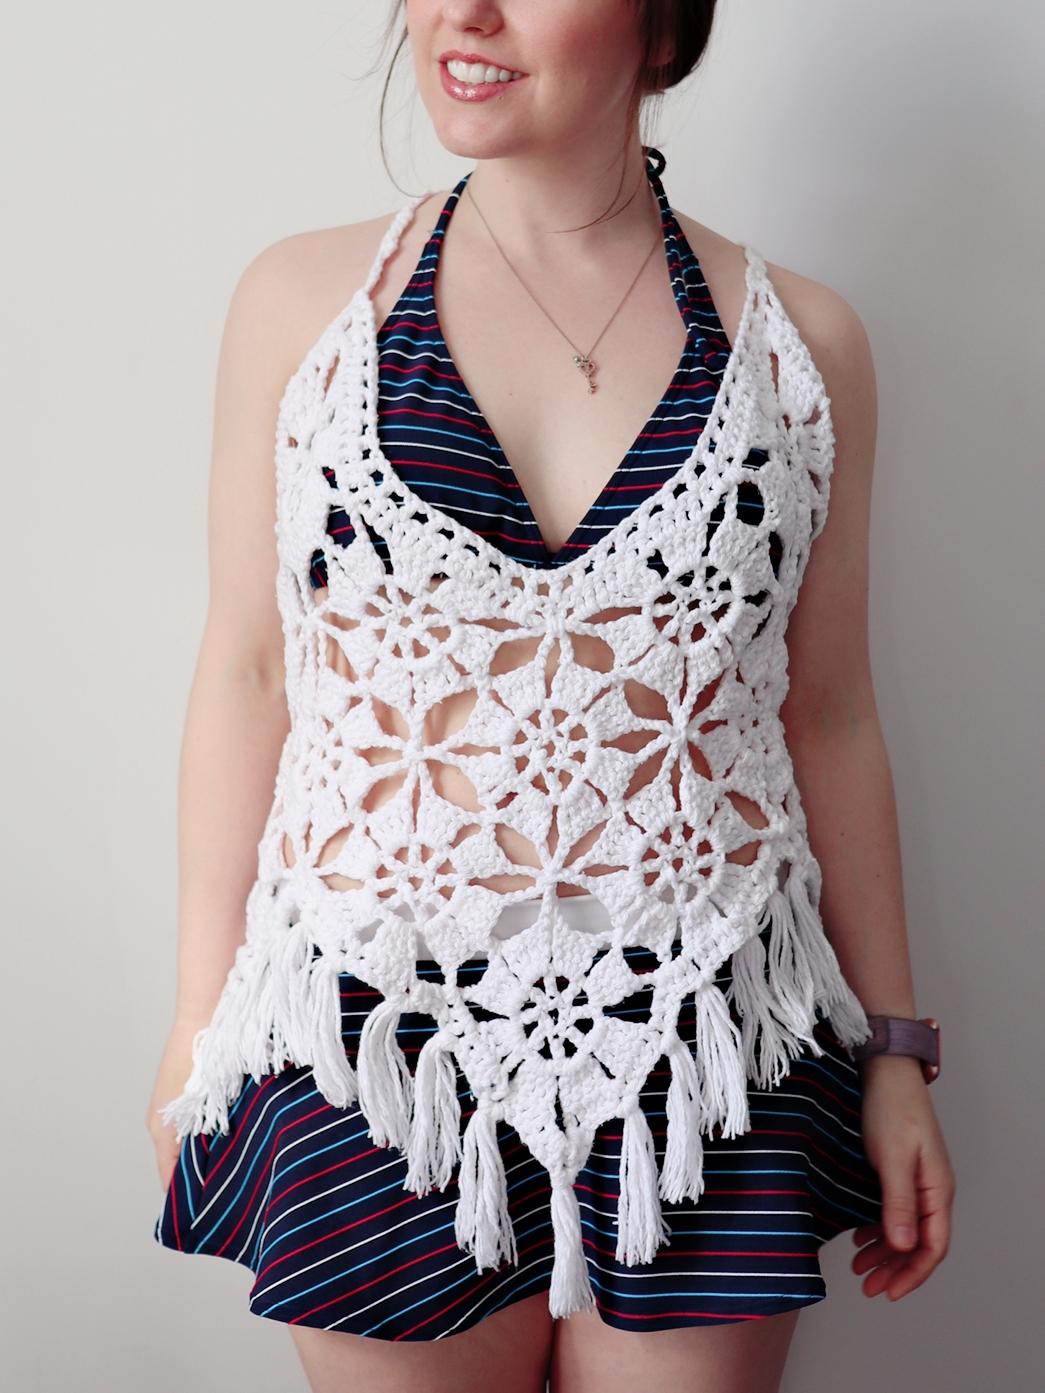 Beach Bum Bouquet Free Crochet Pattern - Ravin Sekai Designs